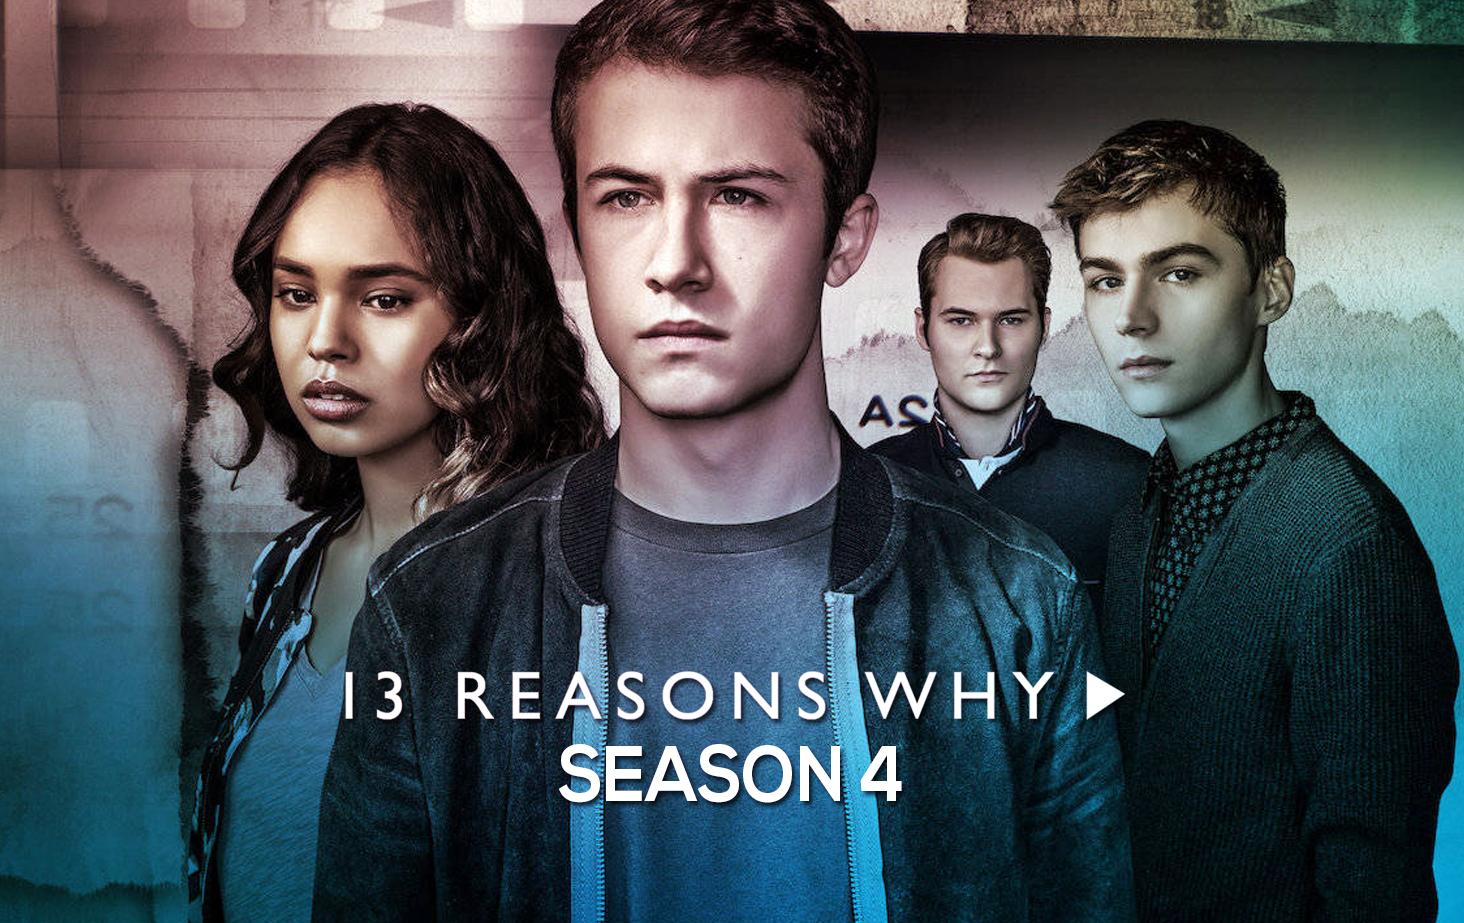 13 reasons why, season finale